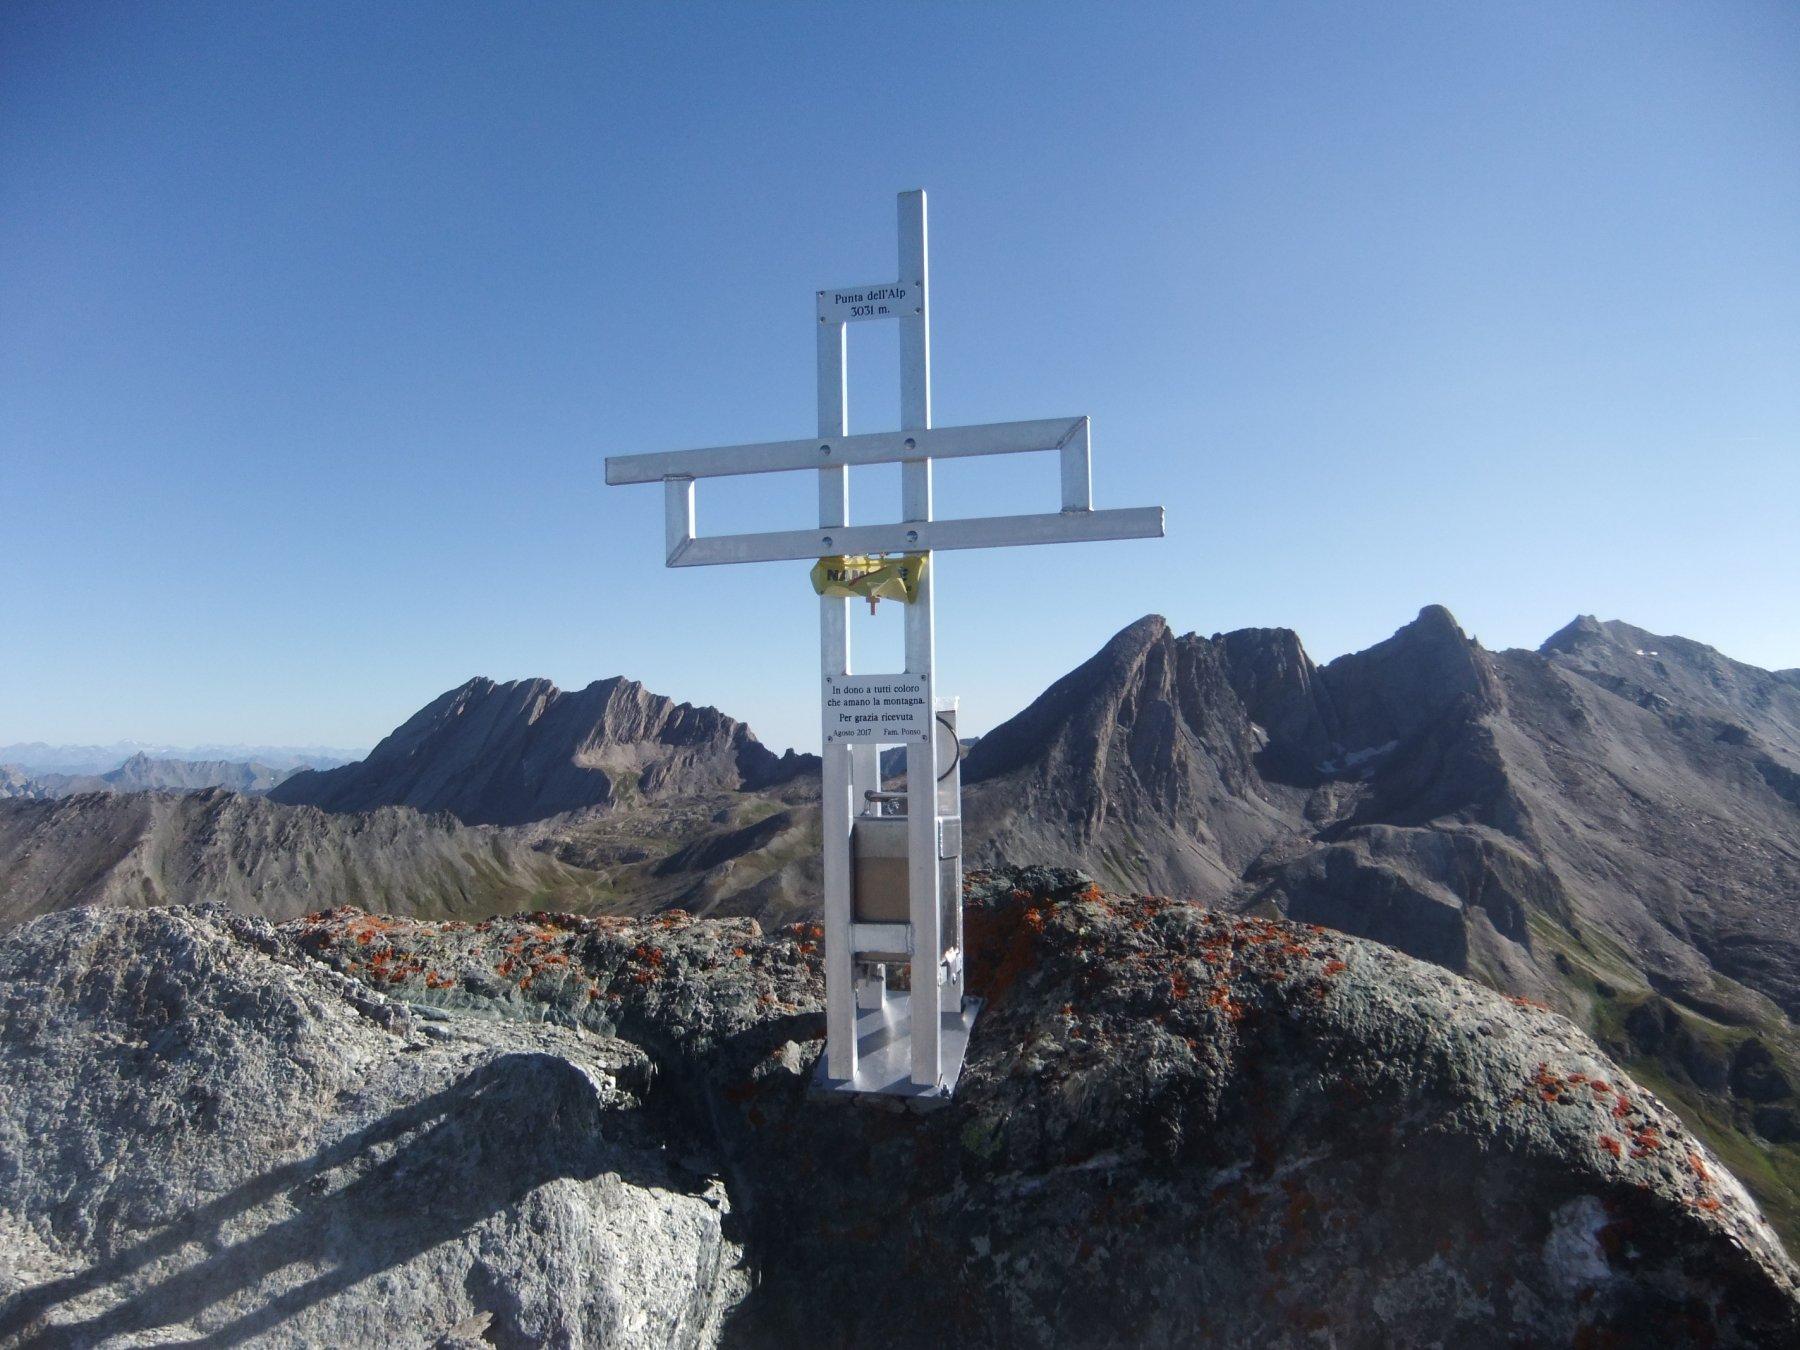 Croce di Punta del Alp